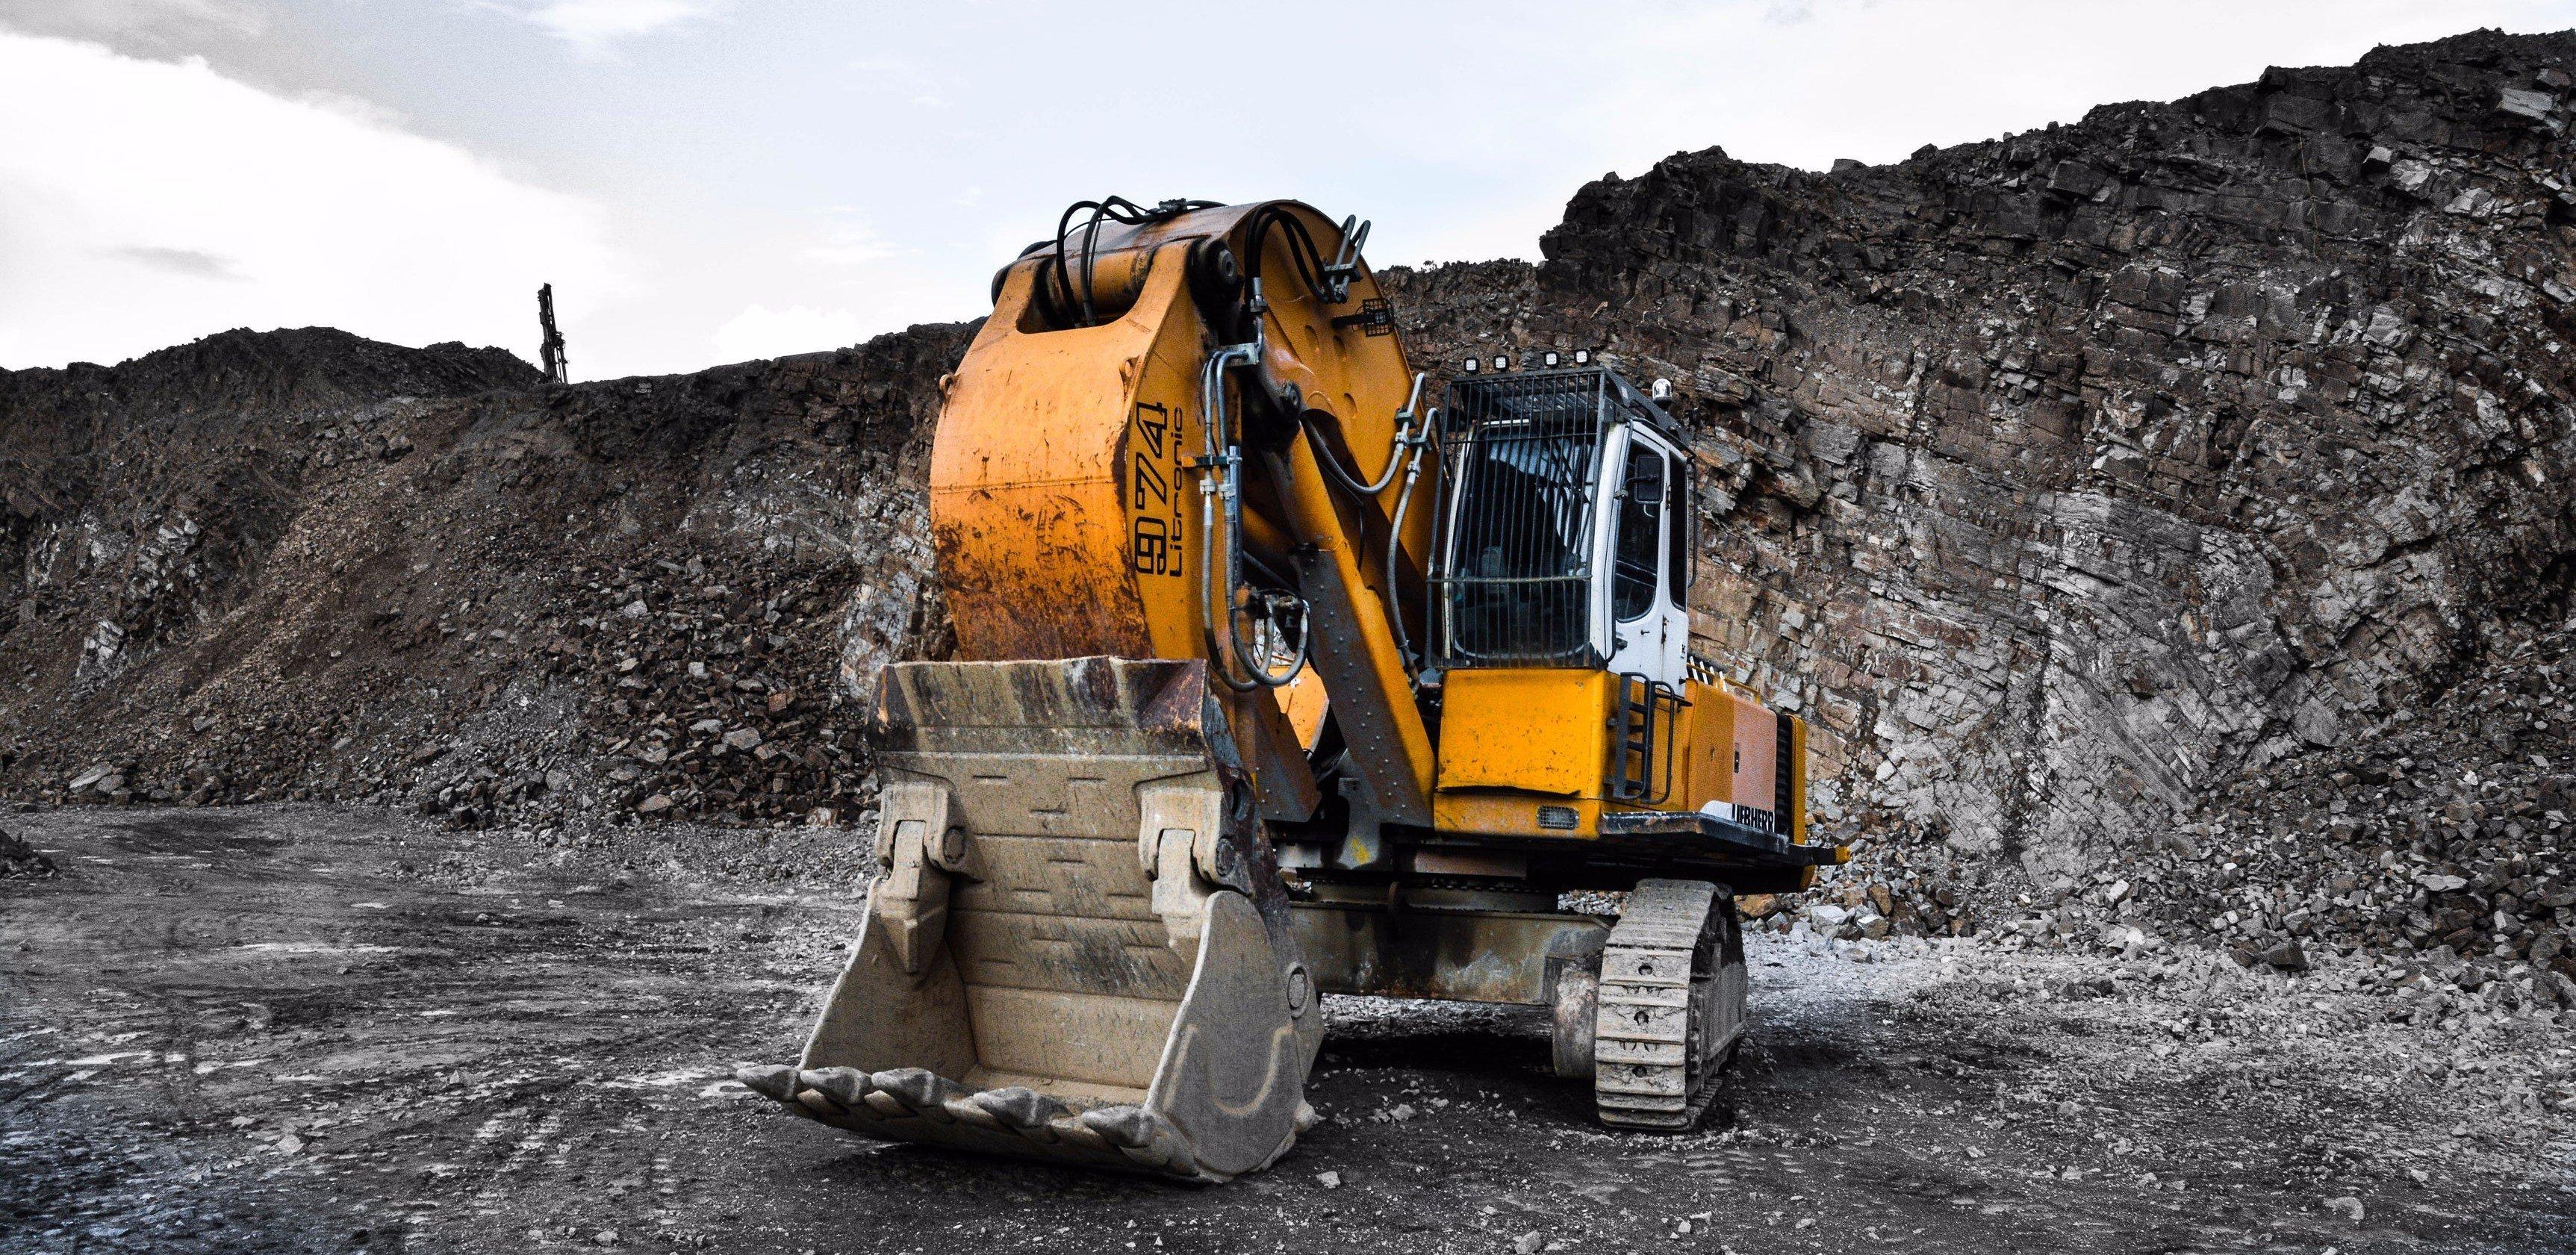 Heavy Excavation Equipment by Jonny Caspari on unsplash.com for E&R Bobcat & Excavator Services